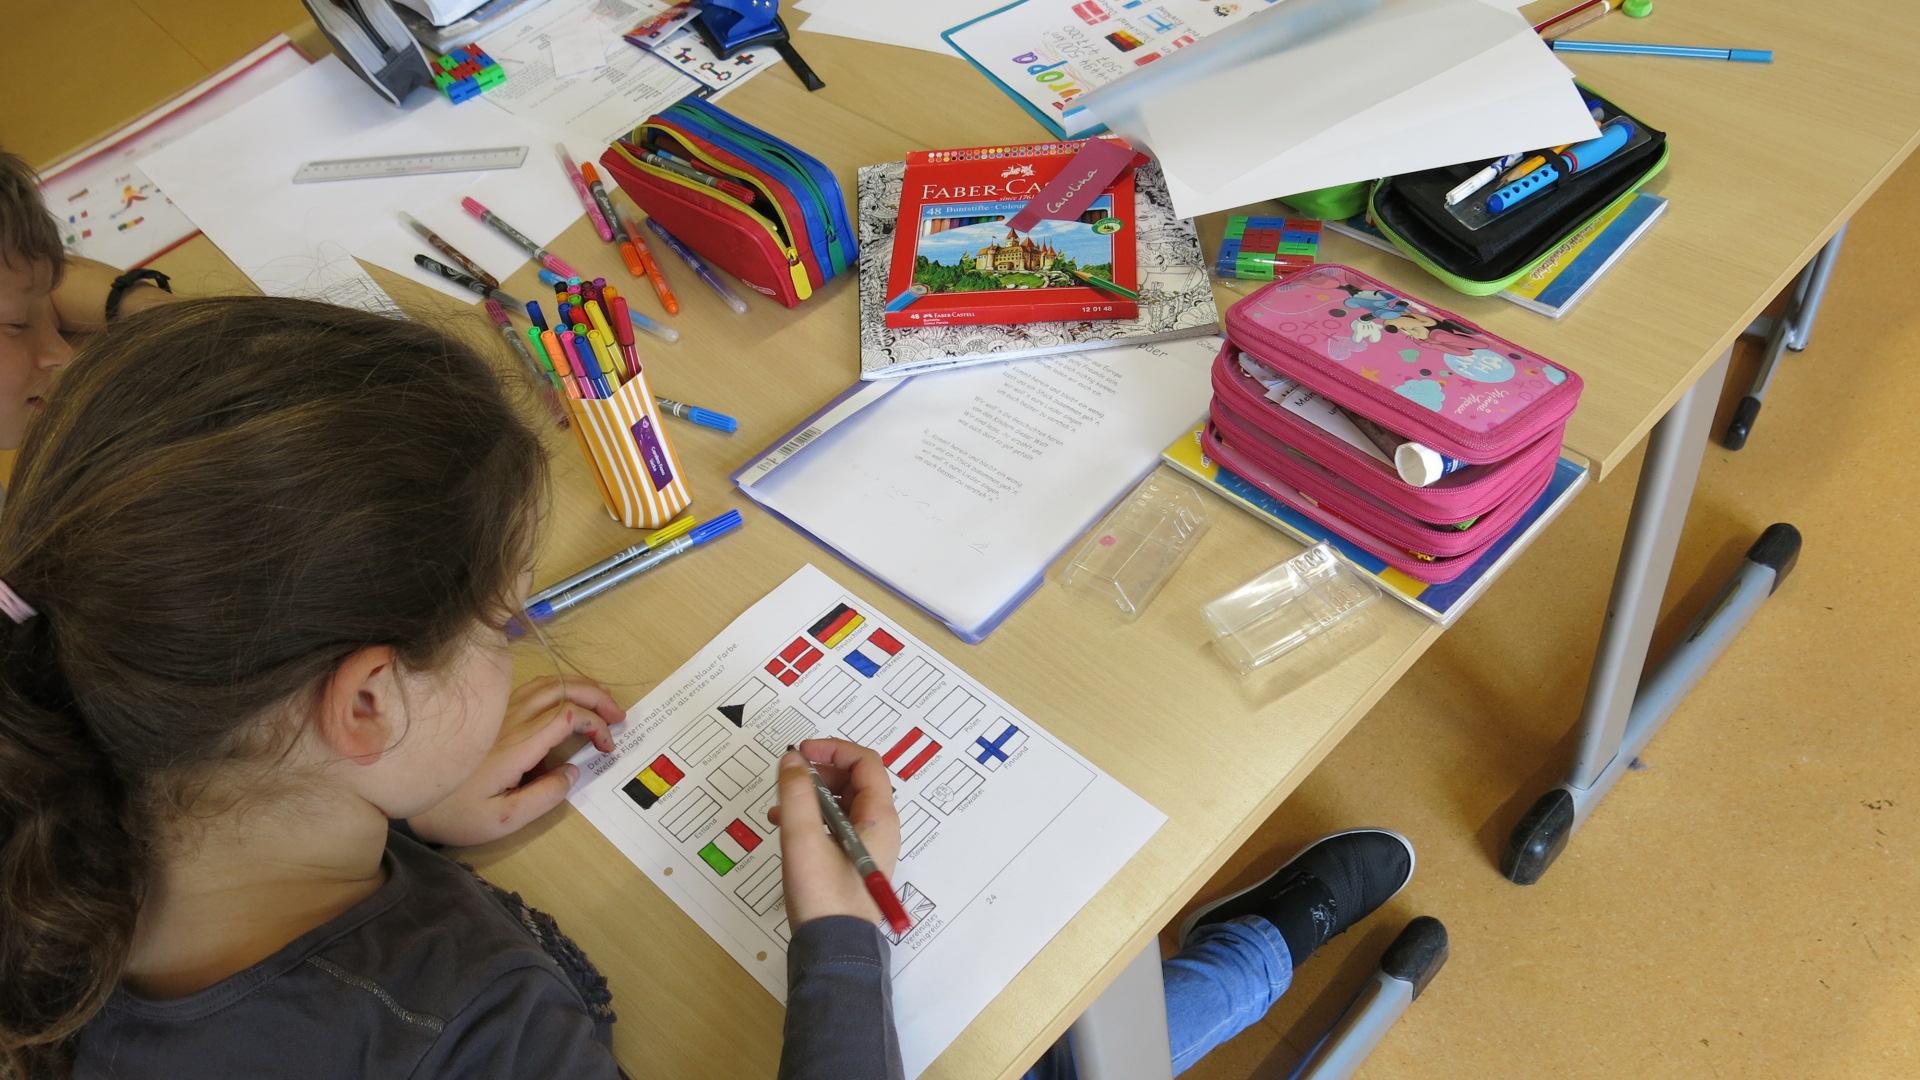 bilinguale grundschule feiert europa bilinguale grundschule altmark. Black Bedroom Furniture Sets. Home Design Ideas